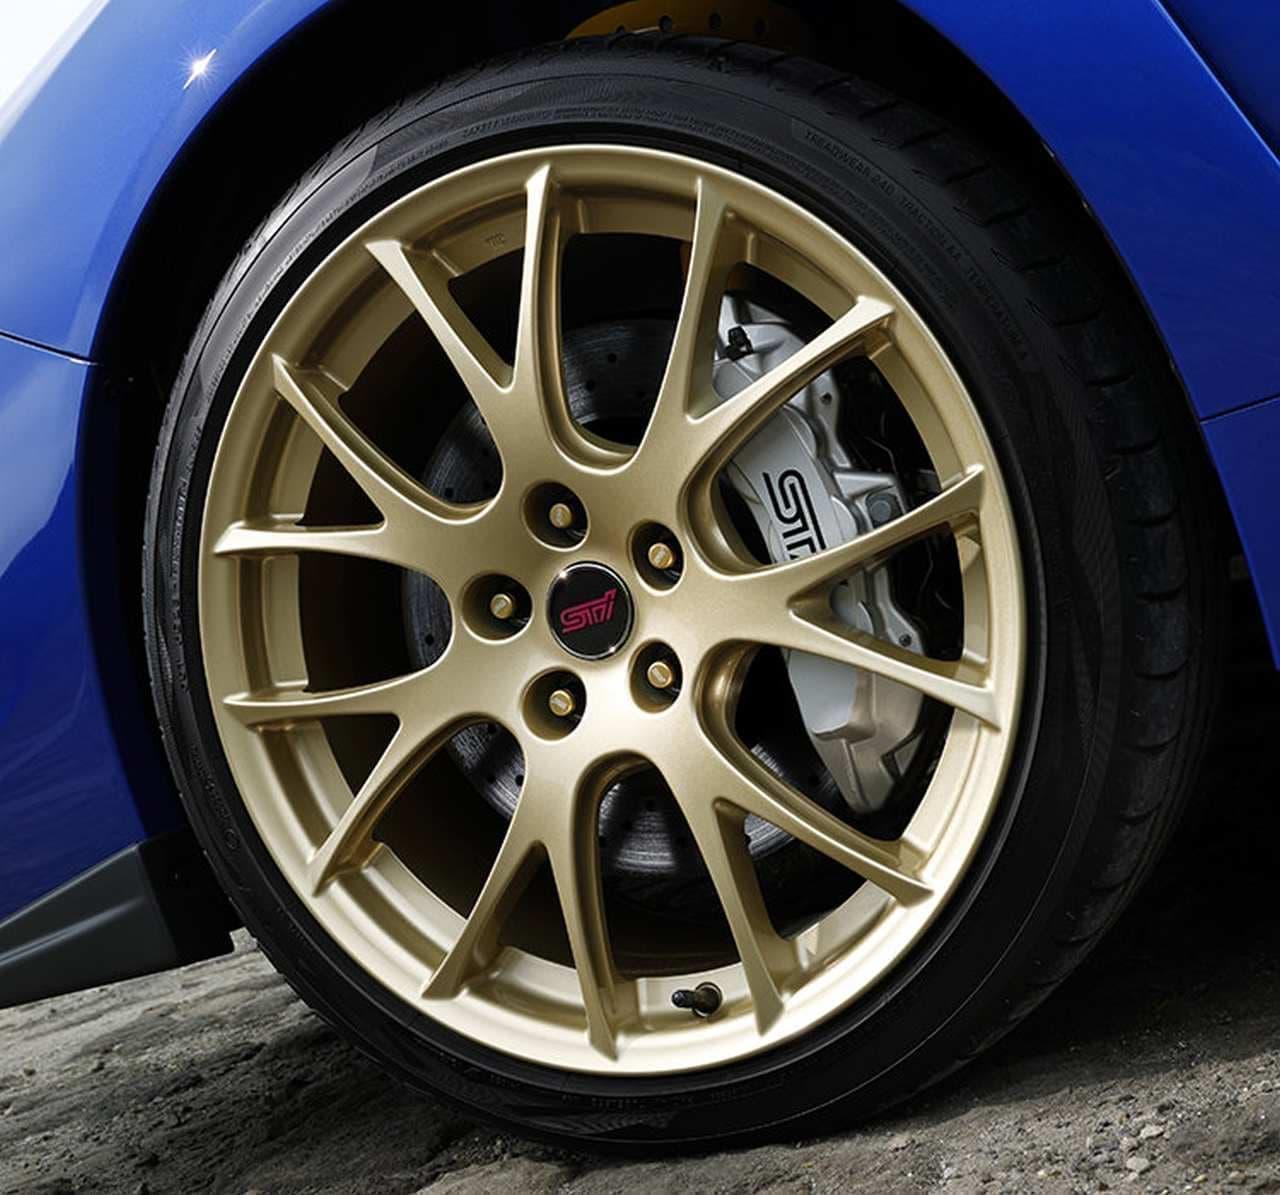 WRX STIの特別仕様車「EJ20 Final Edition」